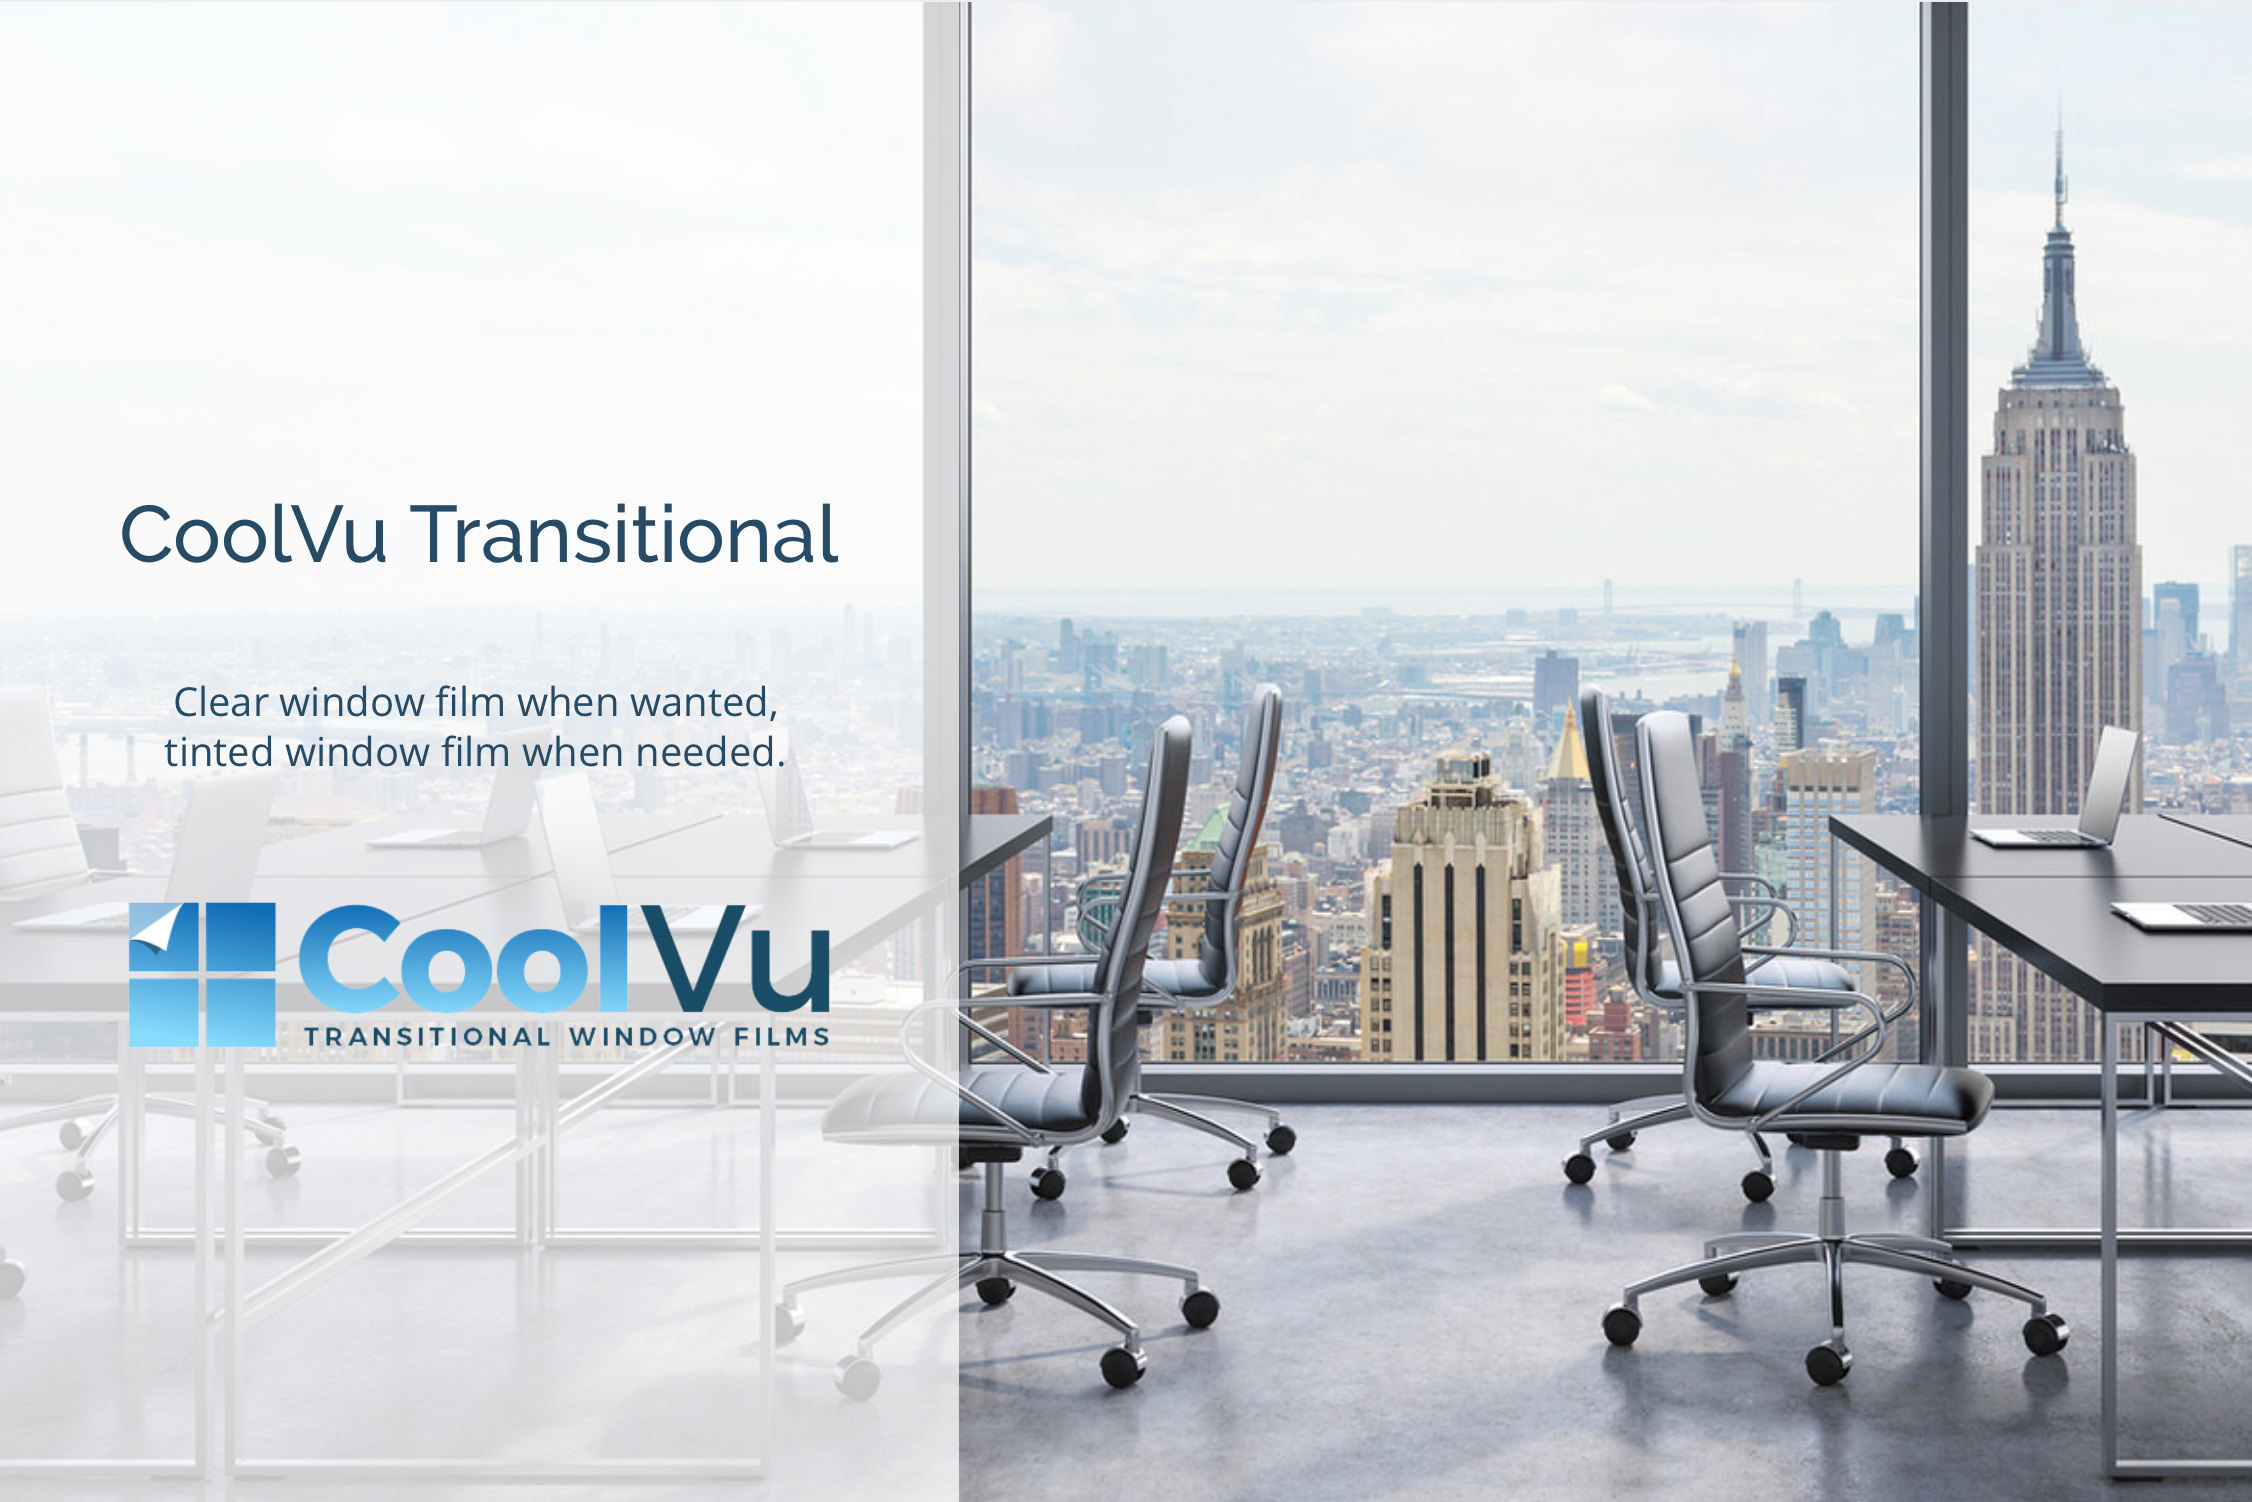 Cool Vu Transitional Film Victoria BC